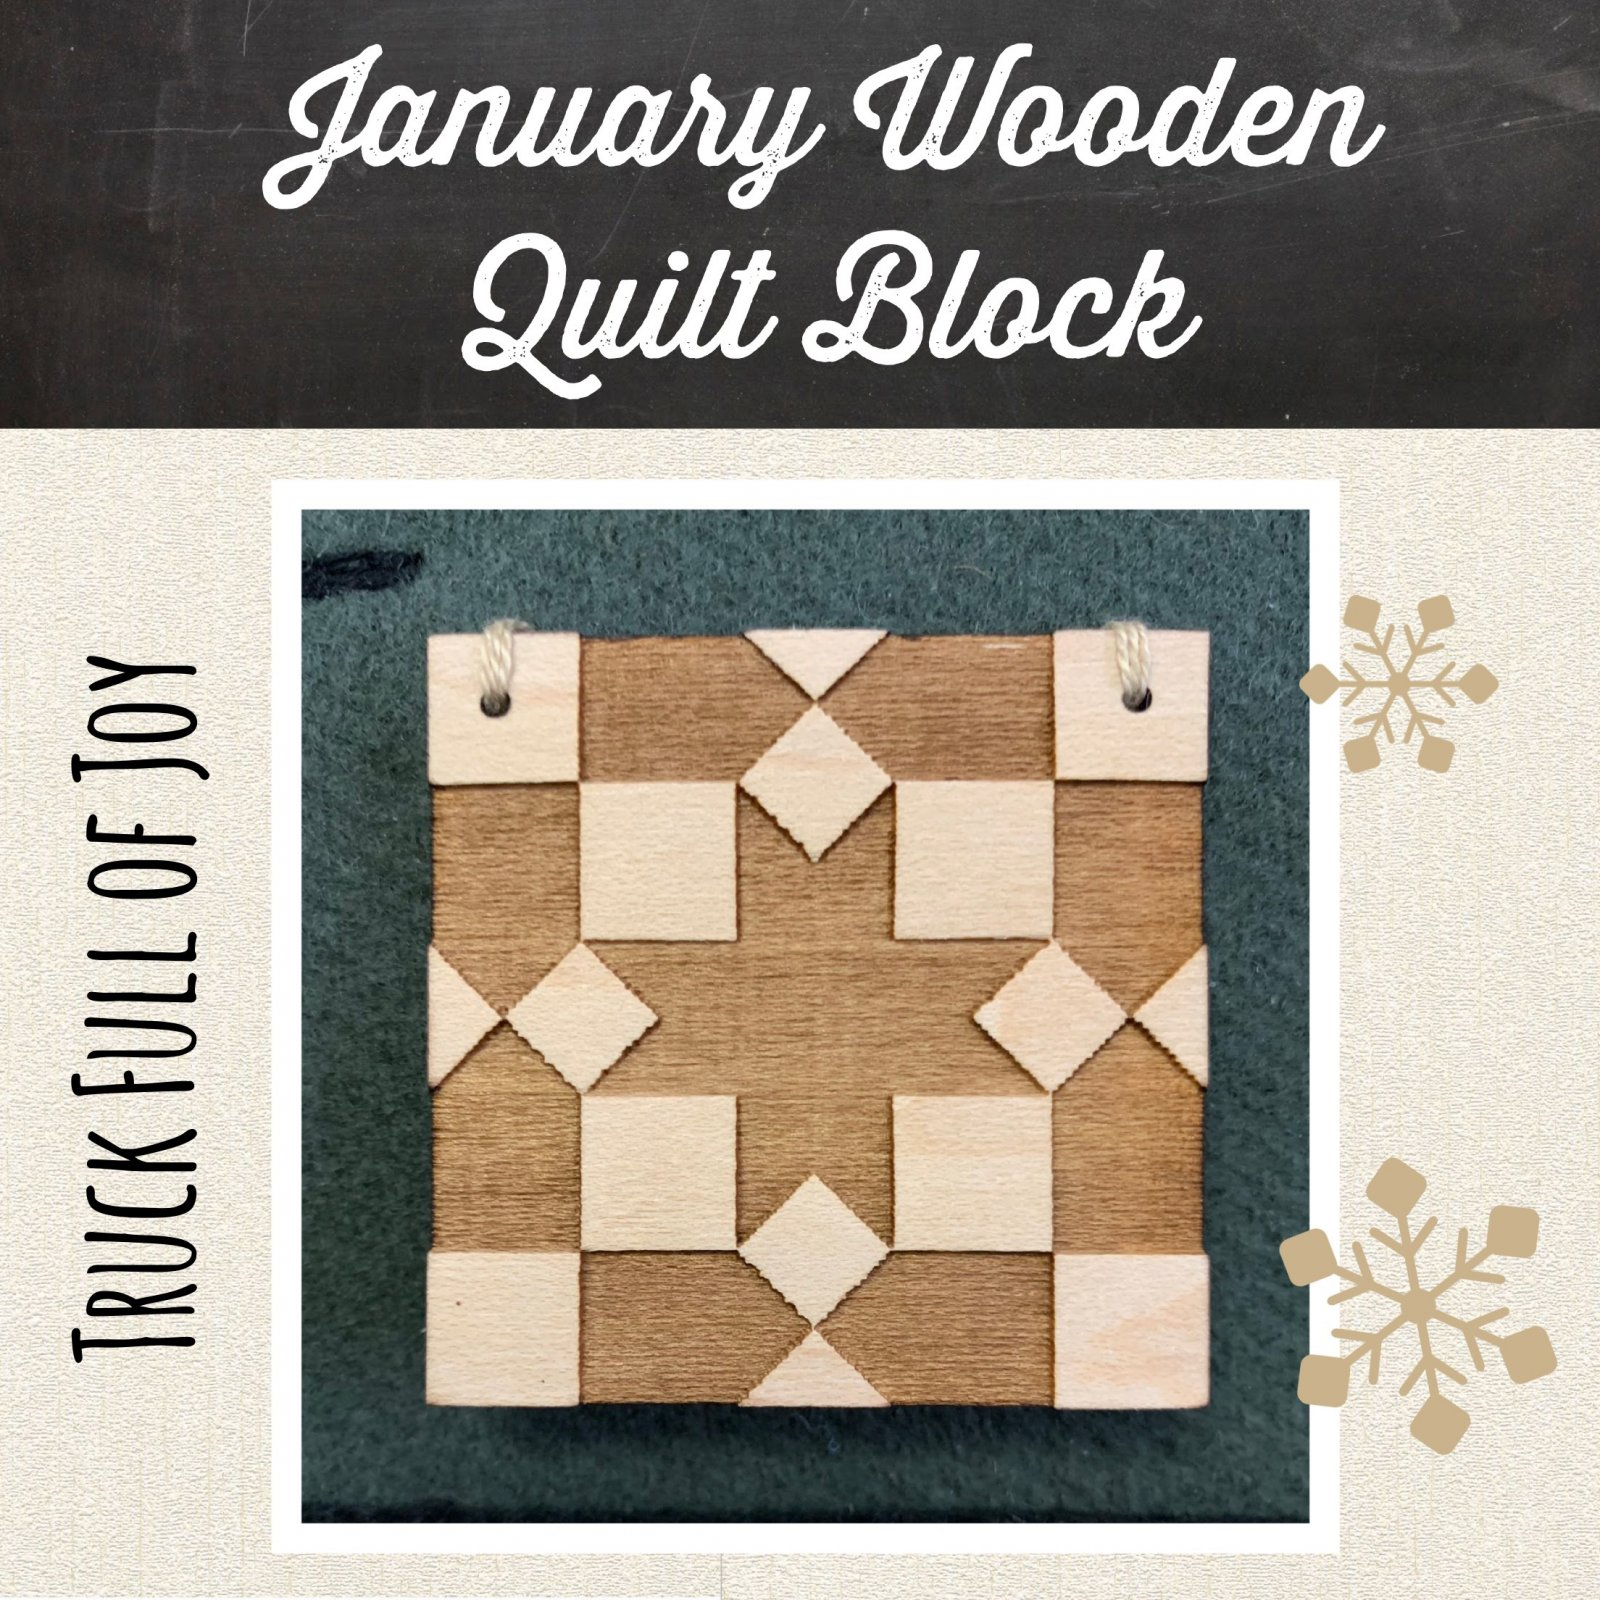 Trucks Full of Joy Monthly Pillows January * Wooden Quilt Block